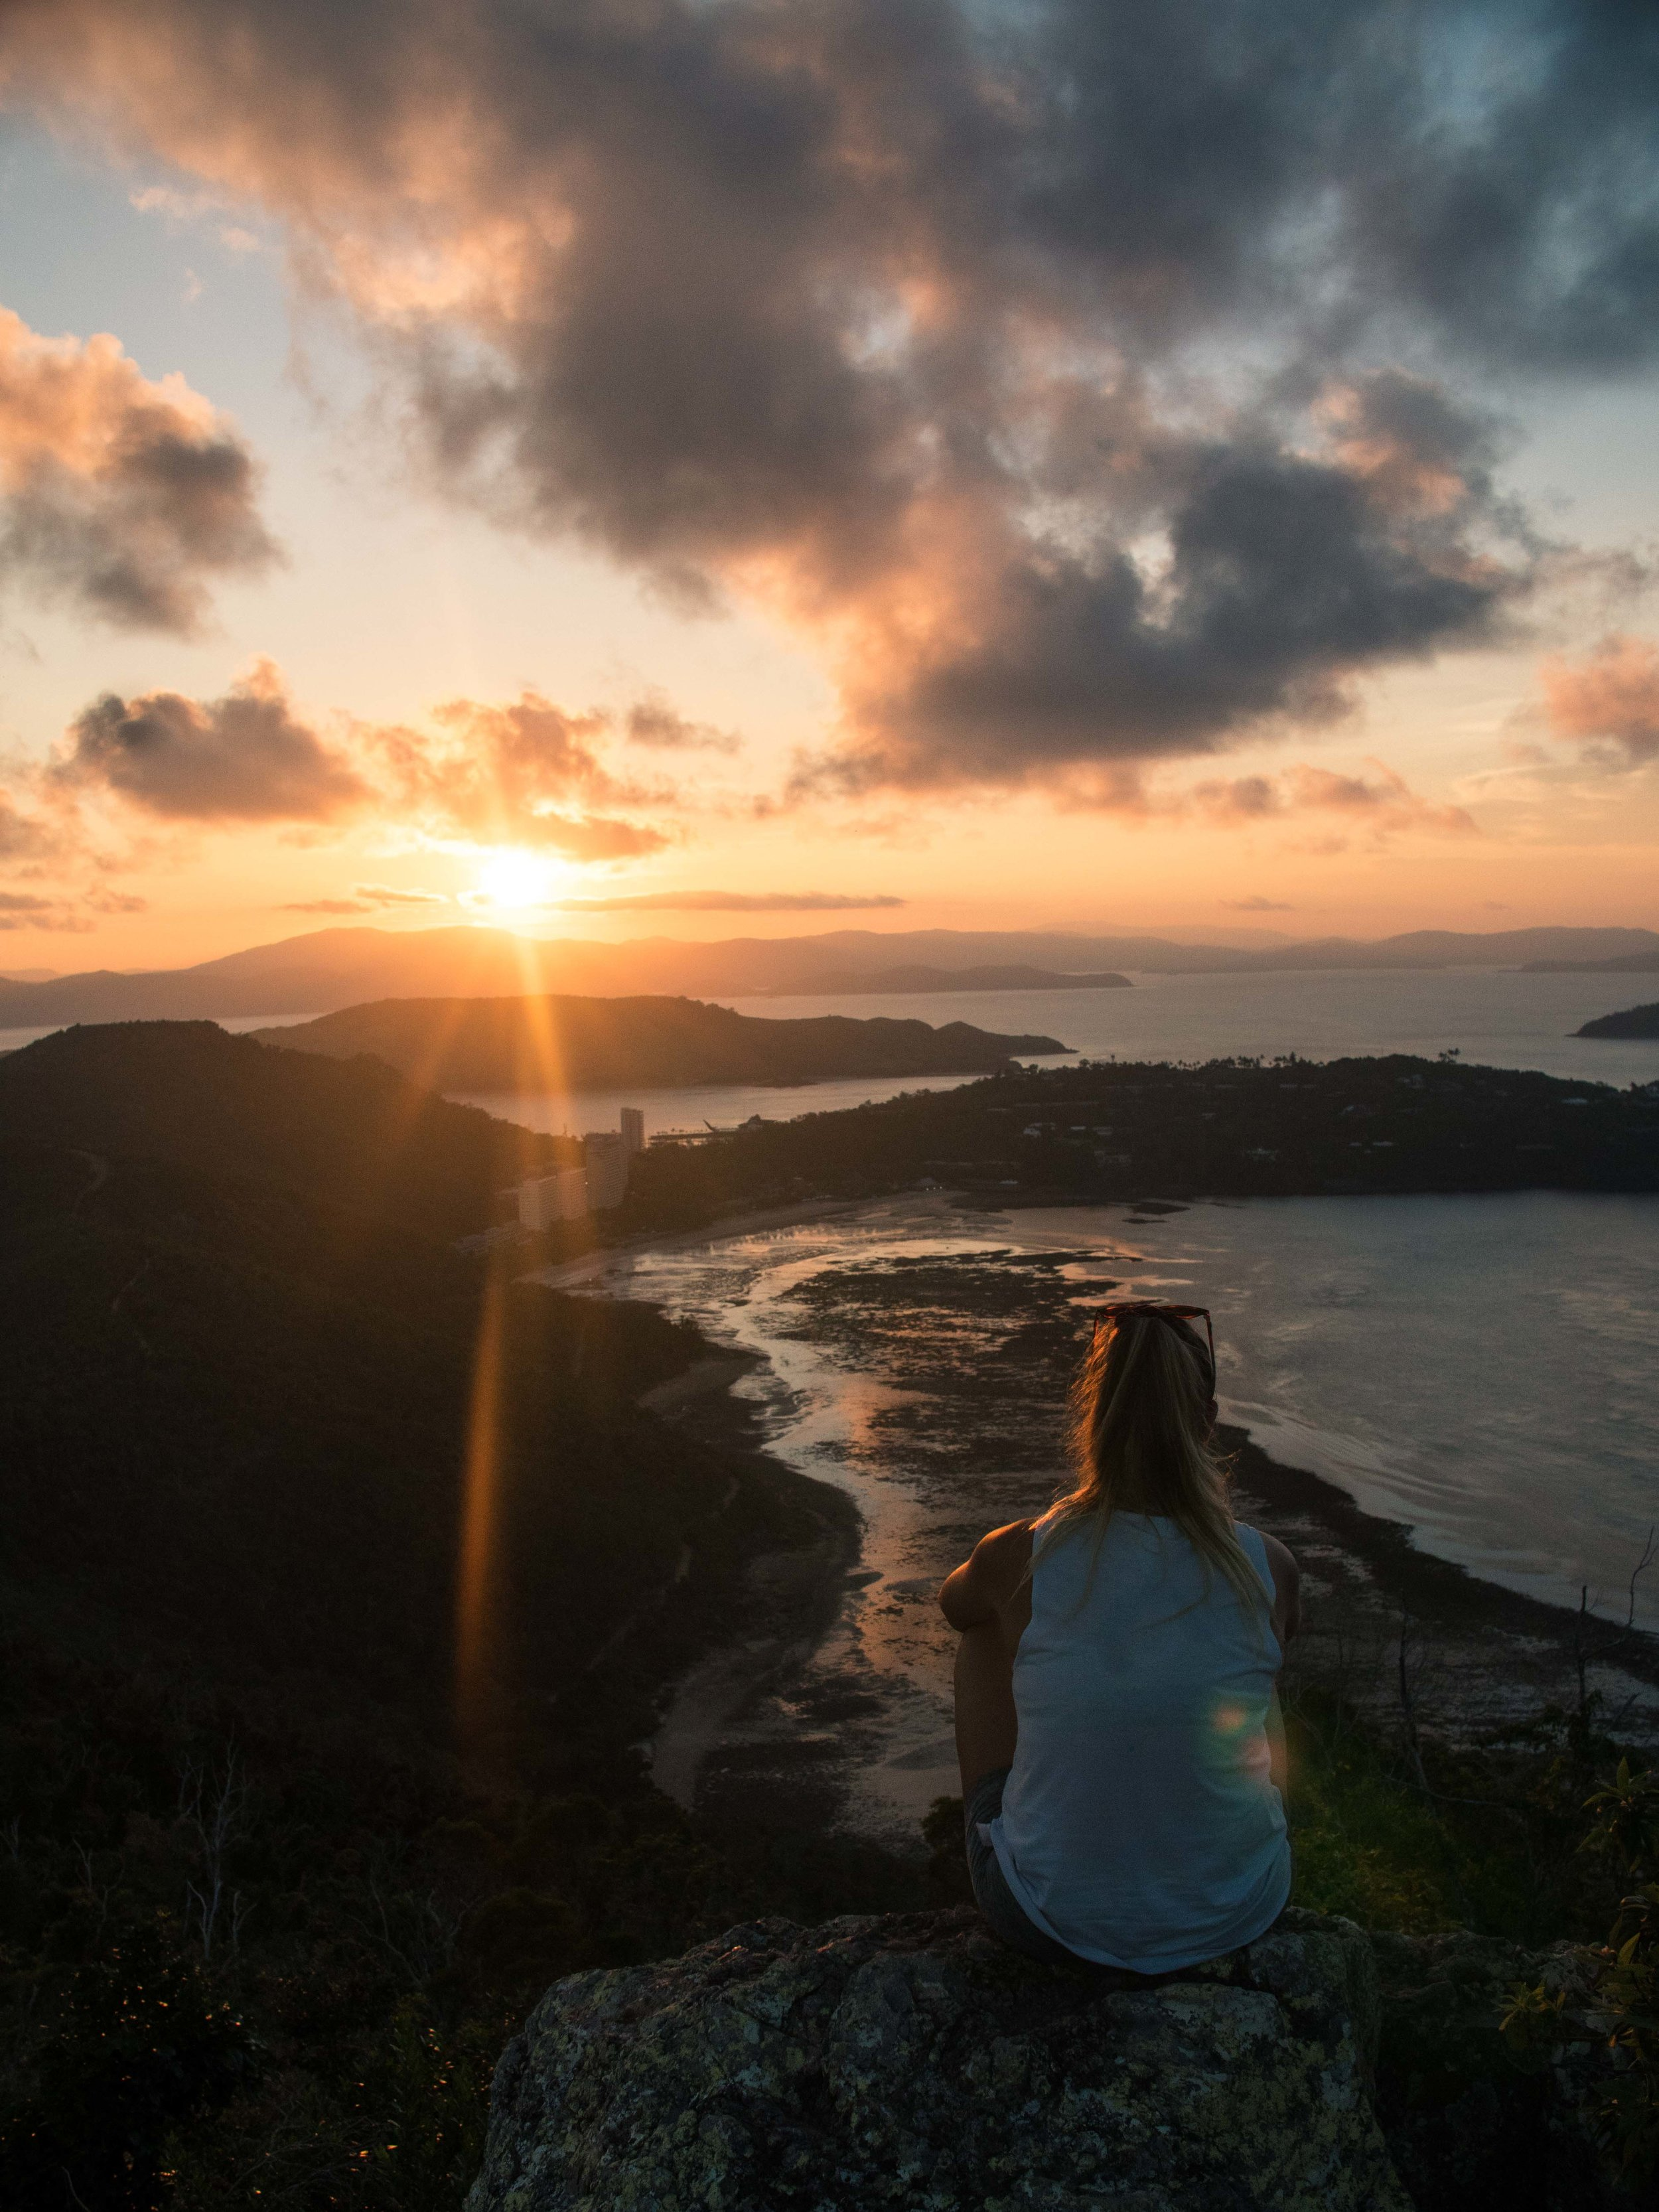 Sunset/Moonrise — Astallation Creations